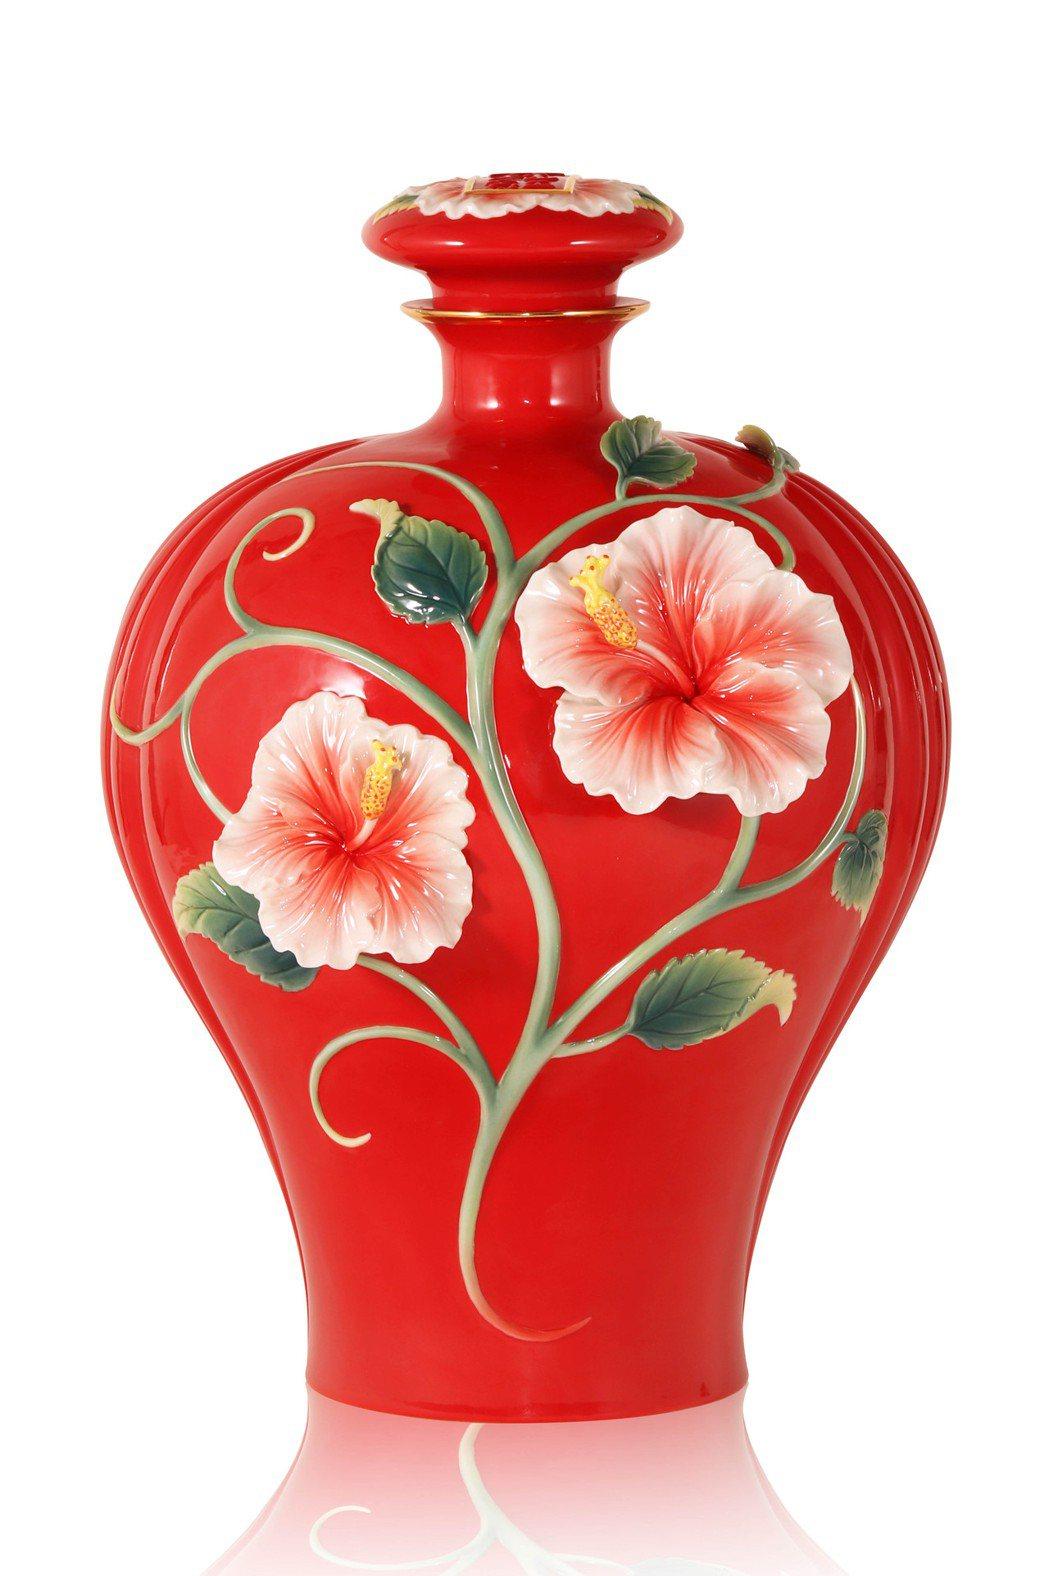 FZ03884 旺富木槿花-女兒紅酒瓶,建議售價66688元。FRANZ/提供